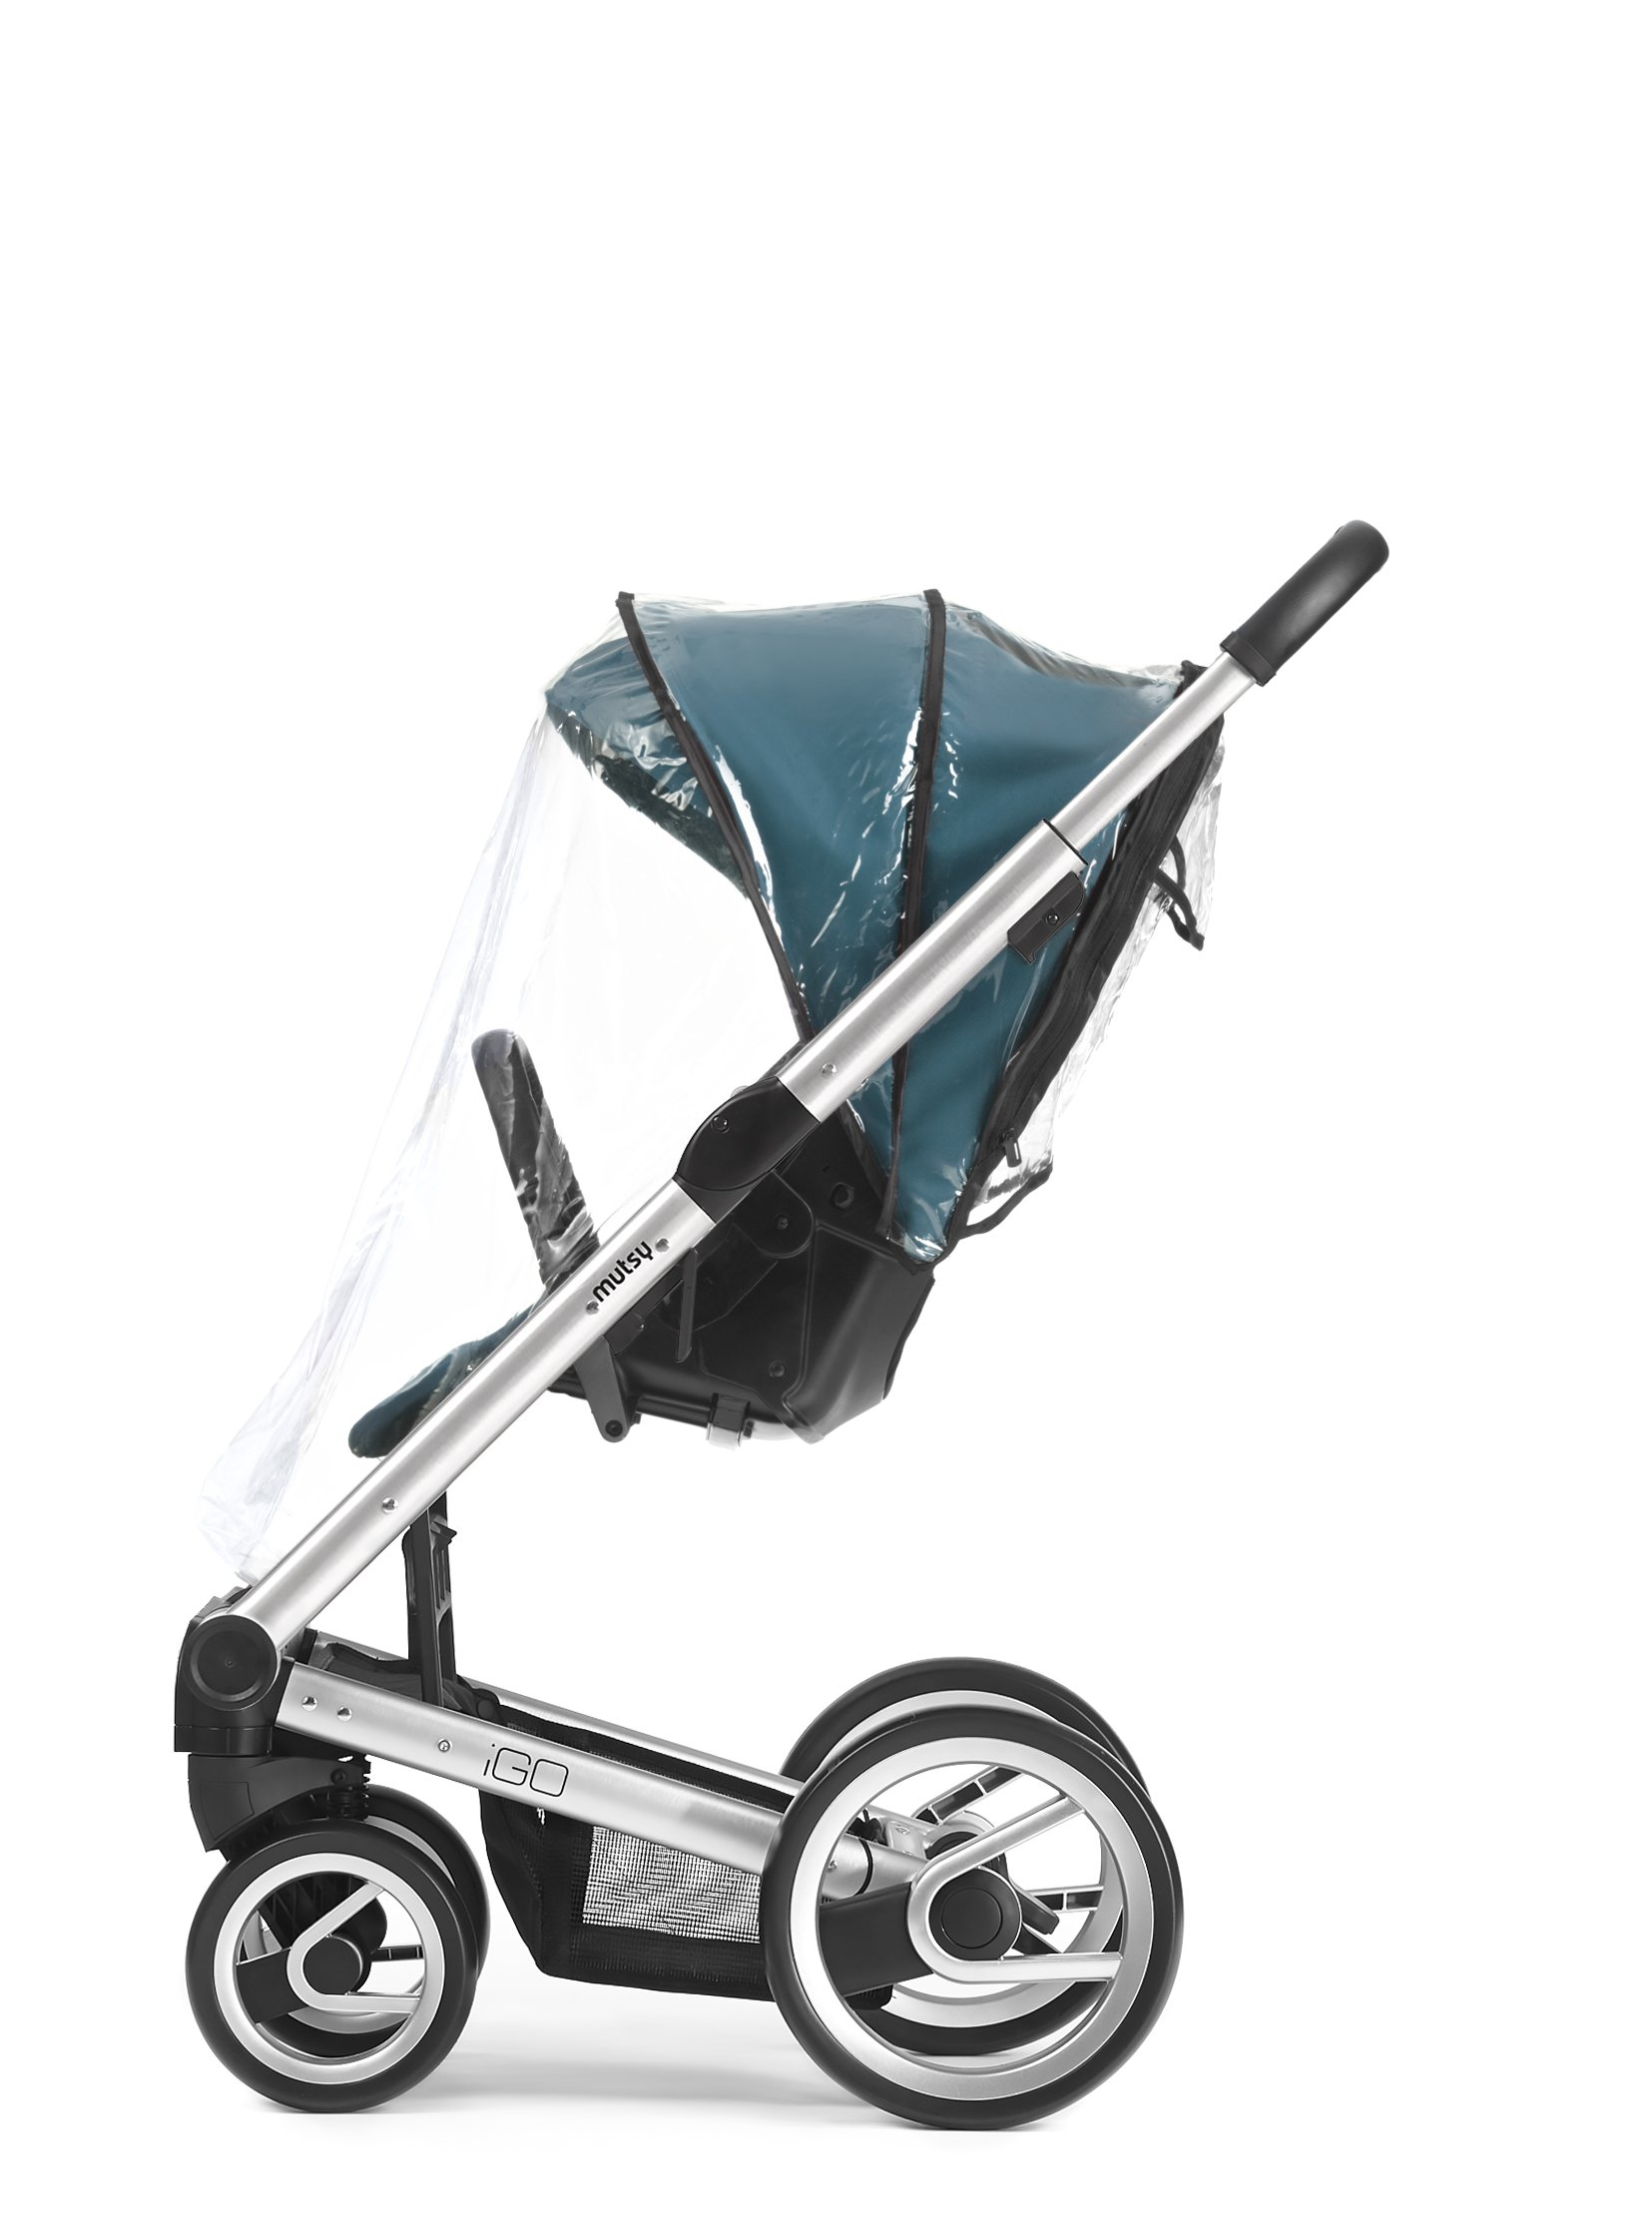 Mutsy Igo Stroller Seat Rain Cover, Clear by Mutsy (Image #1)